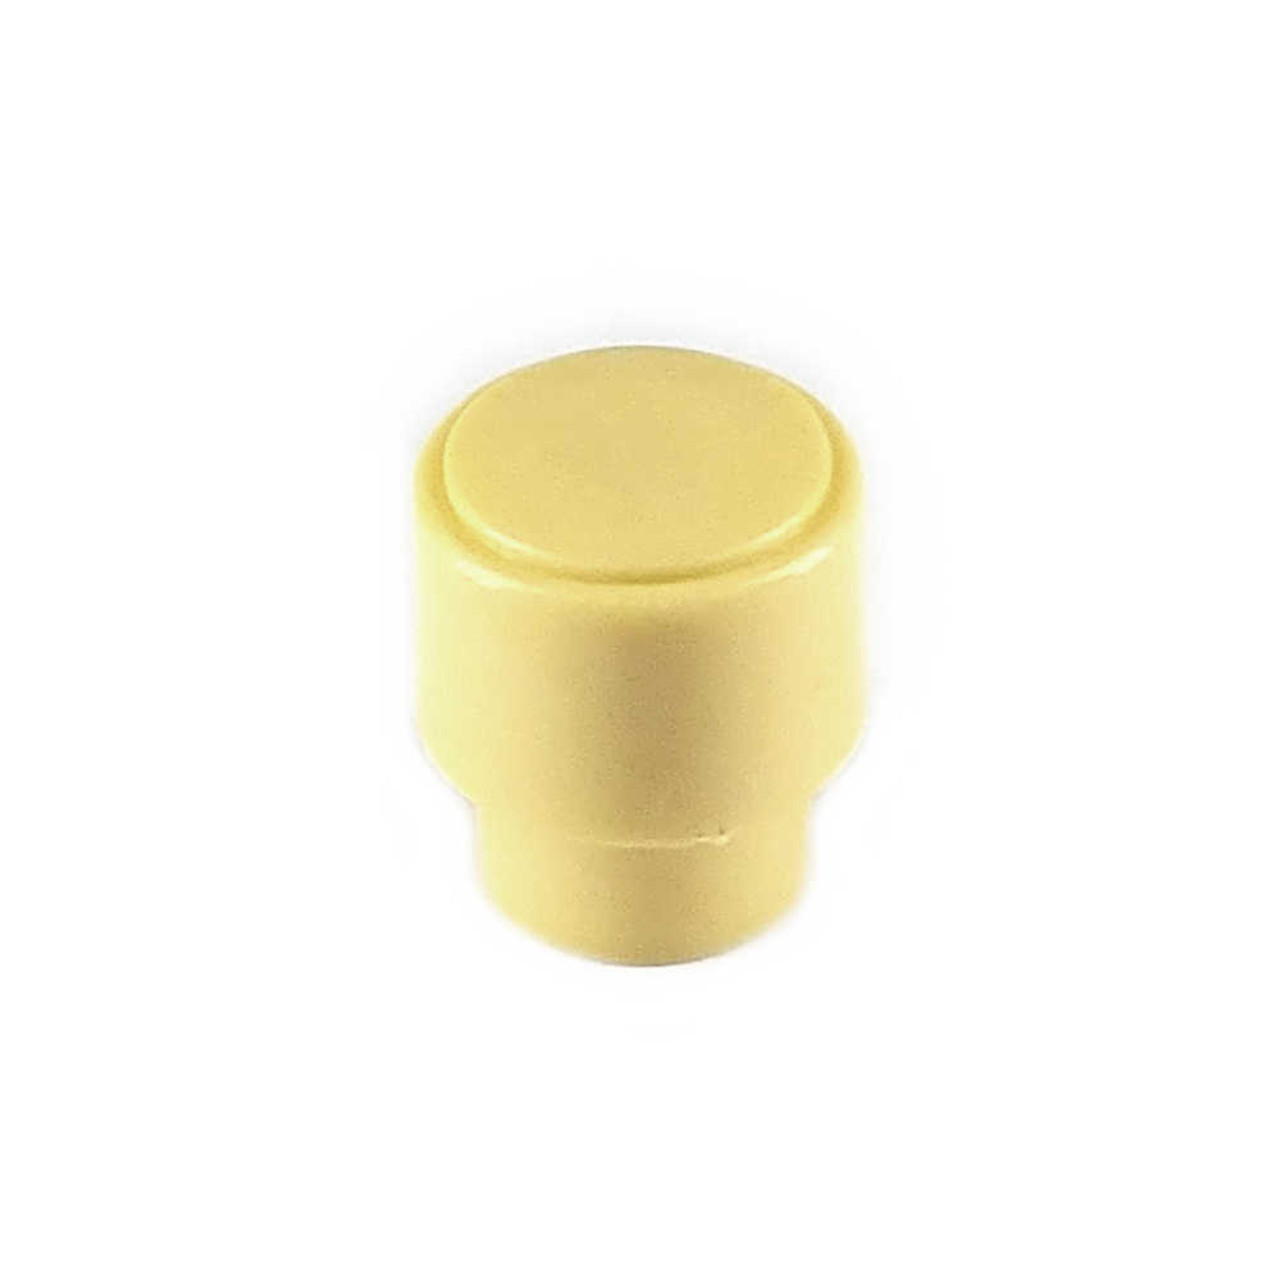 Barrel Switch Tip - Cream